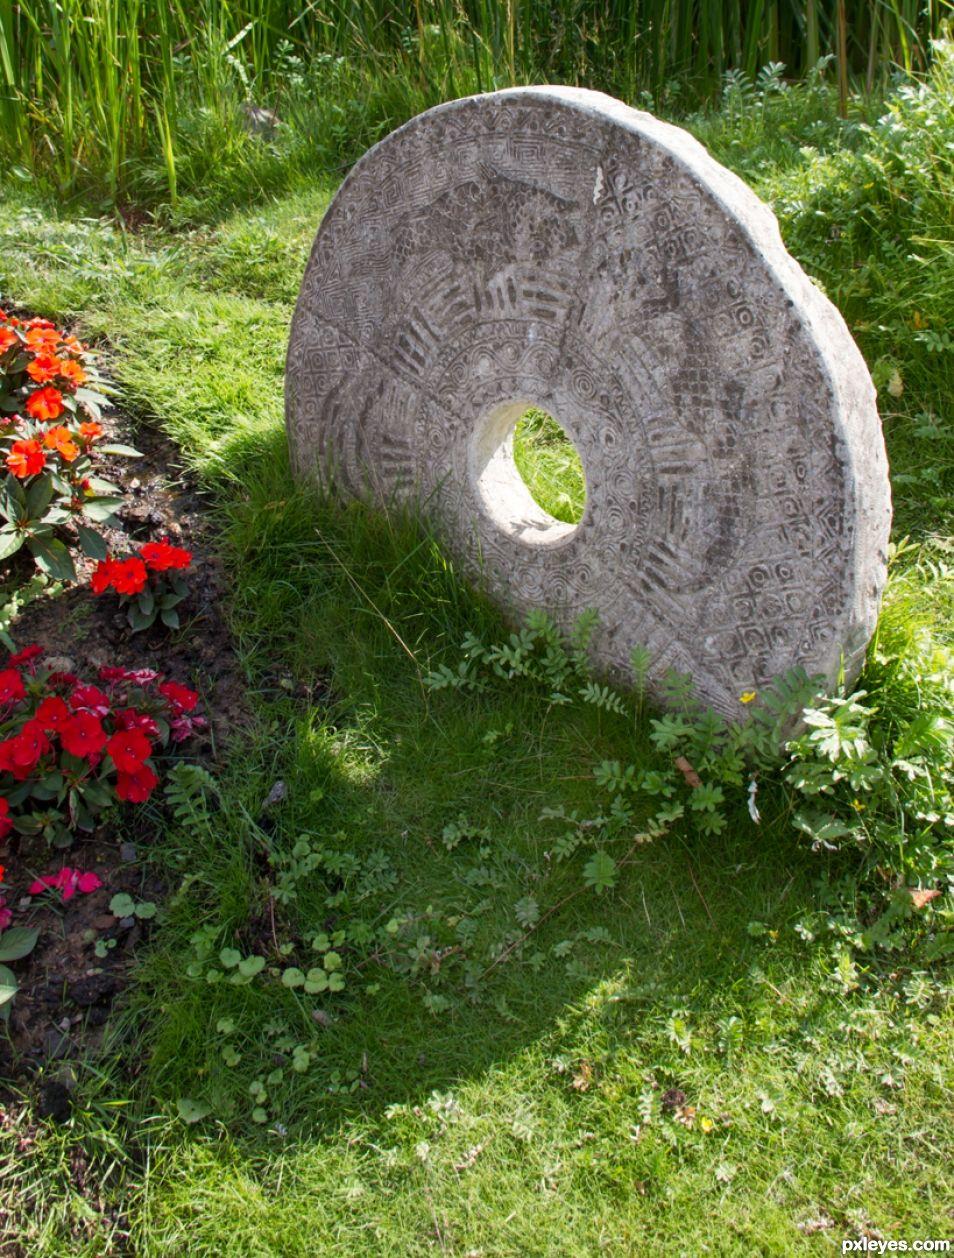 Ornemental millstone